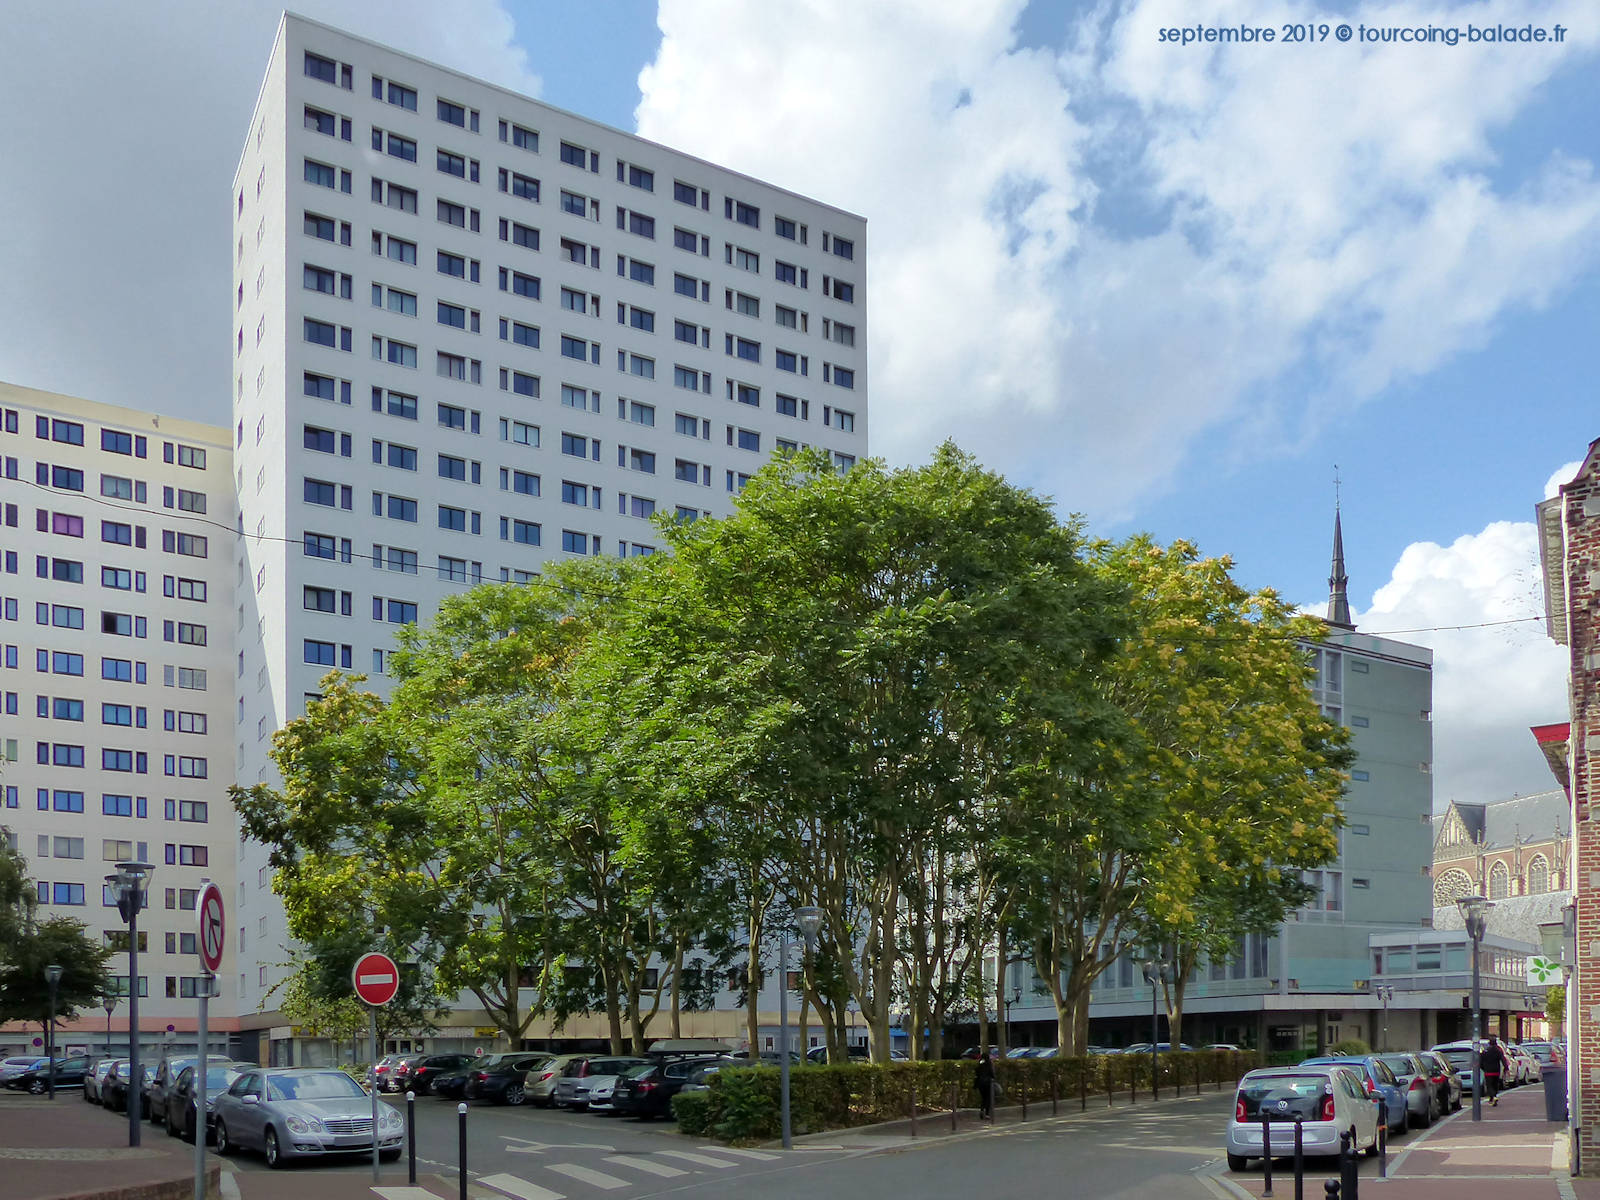 Rue de Tournai, Résidence Bailly, Tourcoing 2019